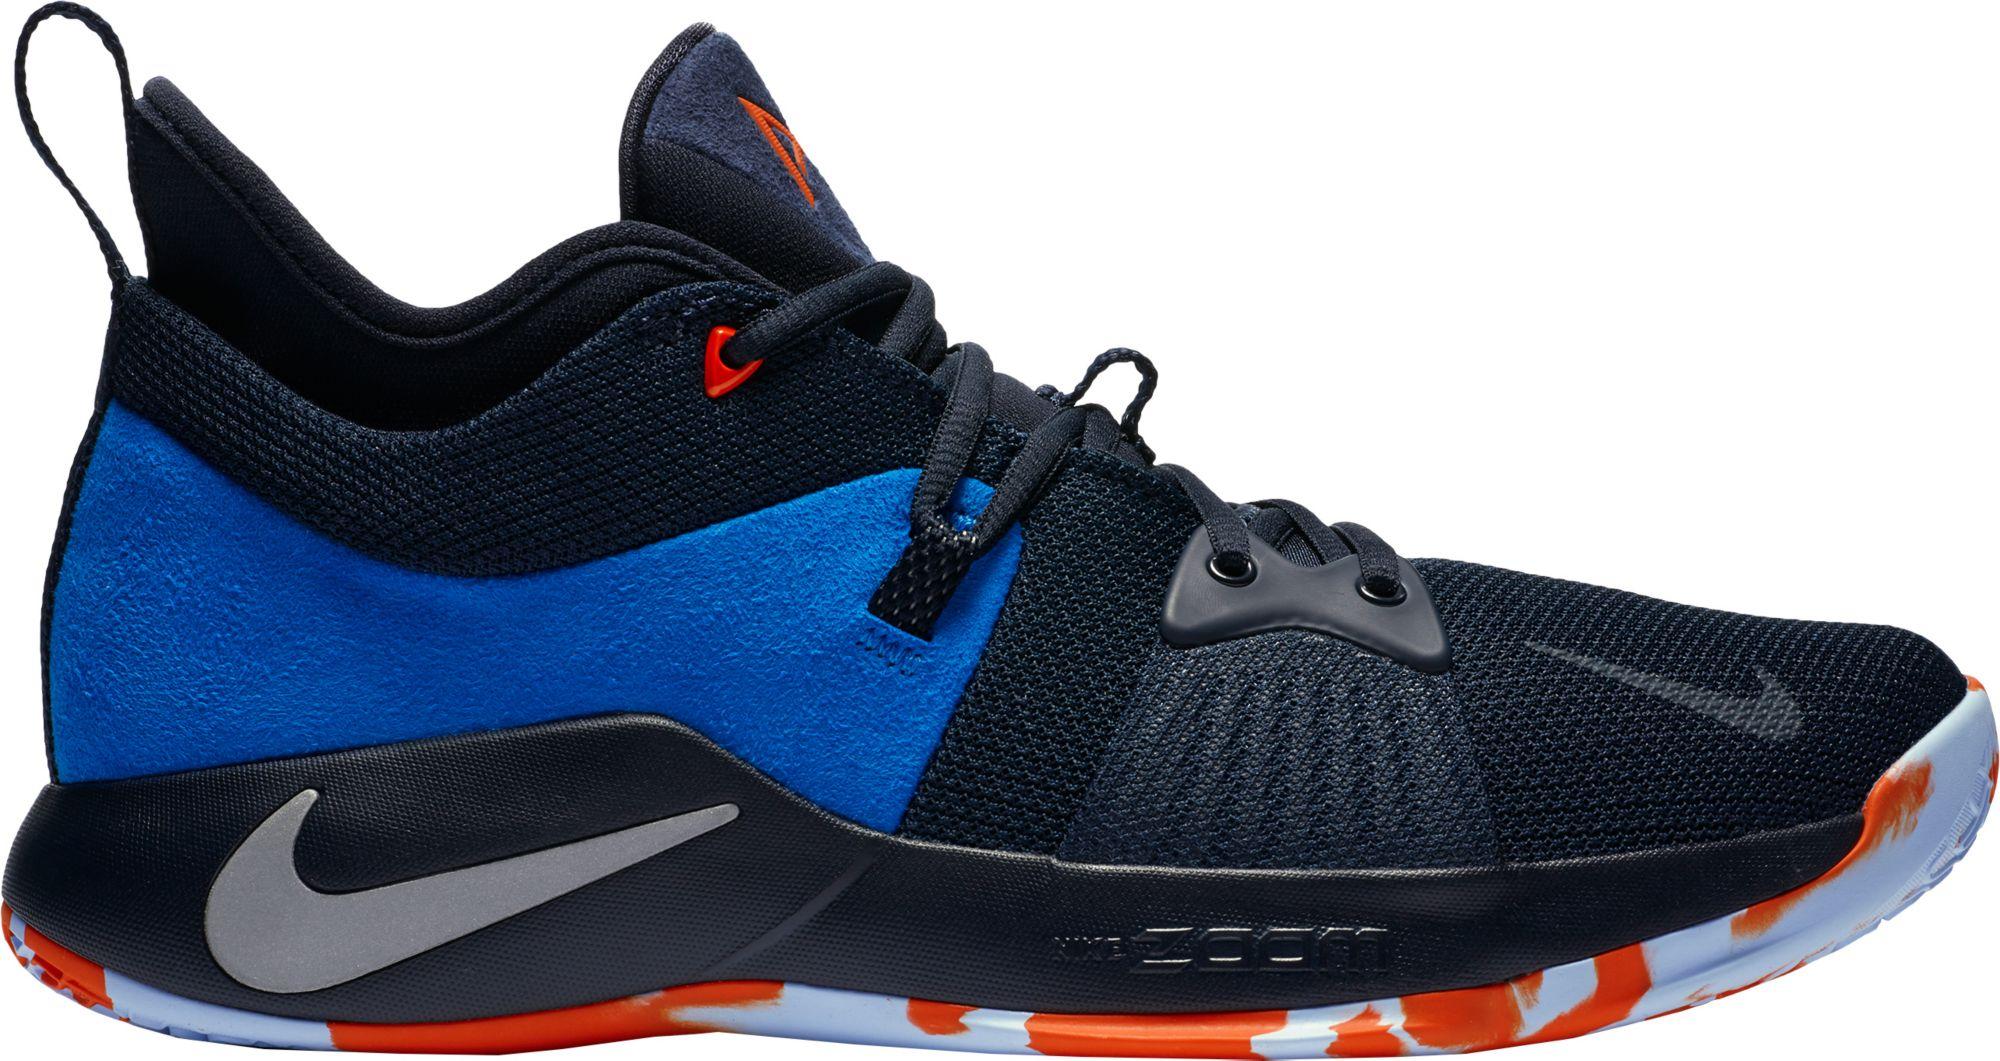 Nike Men's PG 2 Basketball Shoes. 0:00. 0:00 / 0:00. noImageFound ???